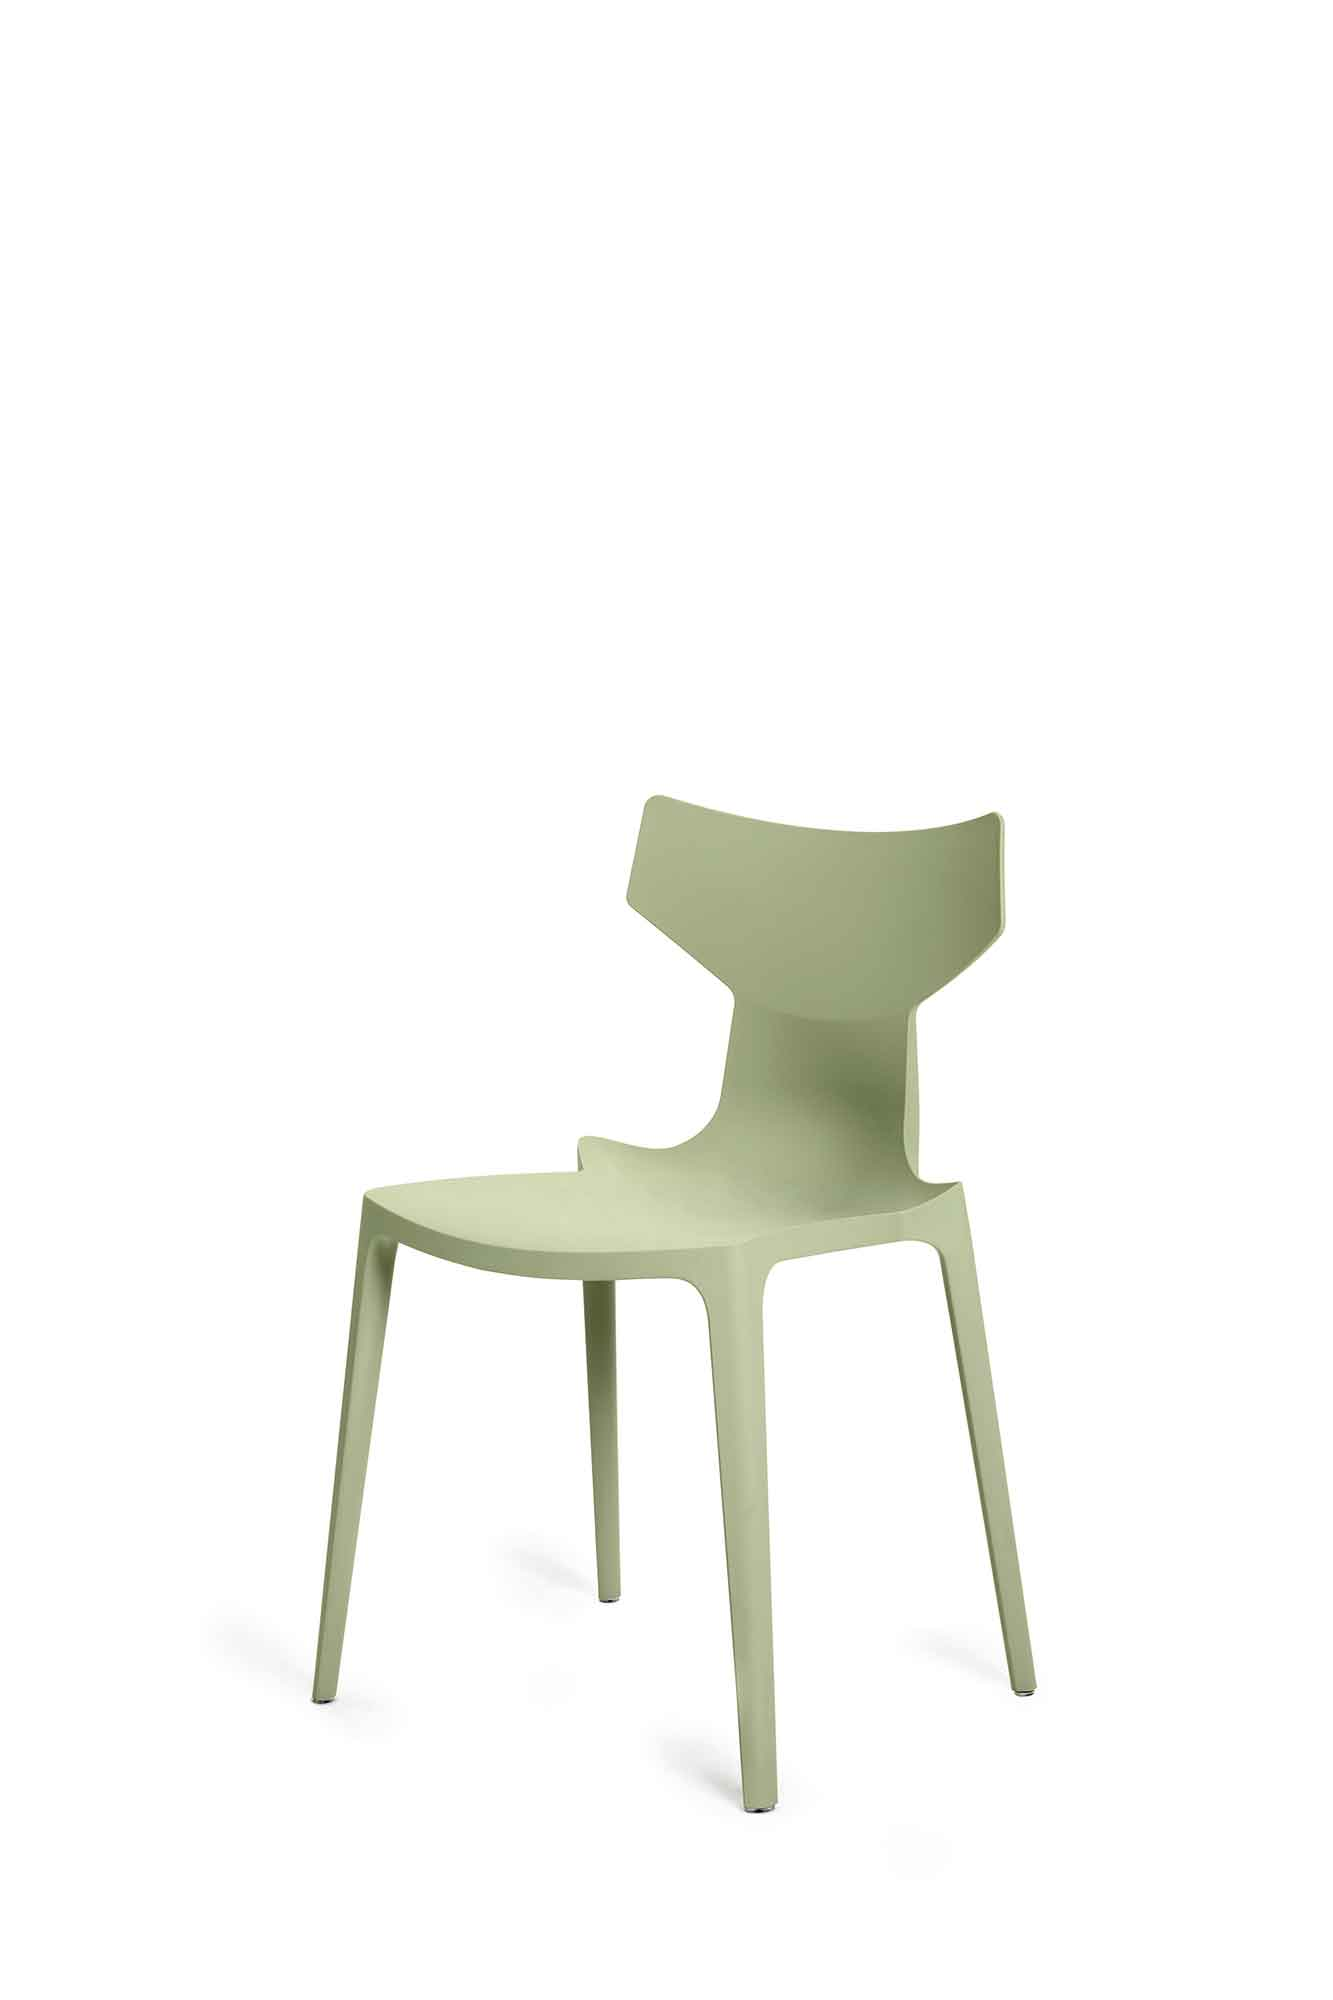 Re-Chair, Citterio, Kartell